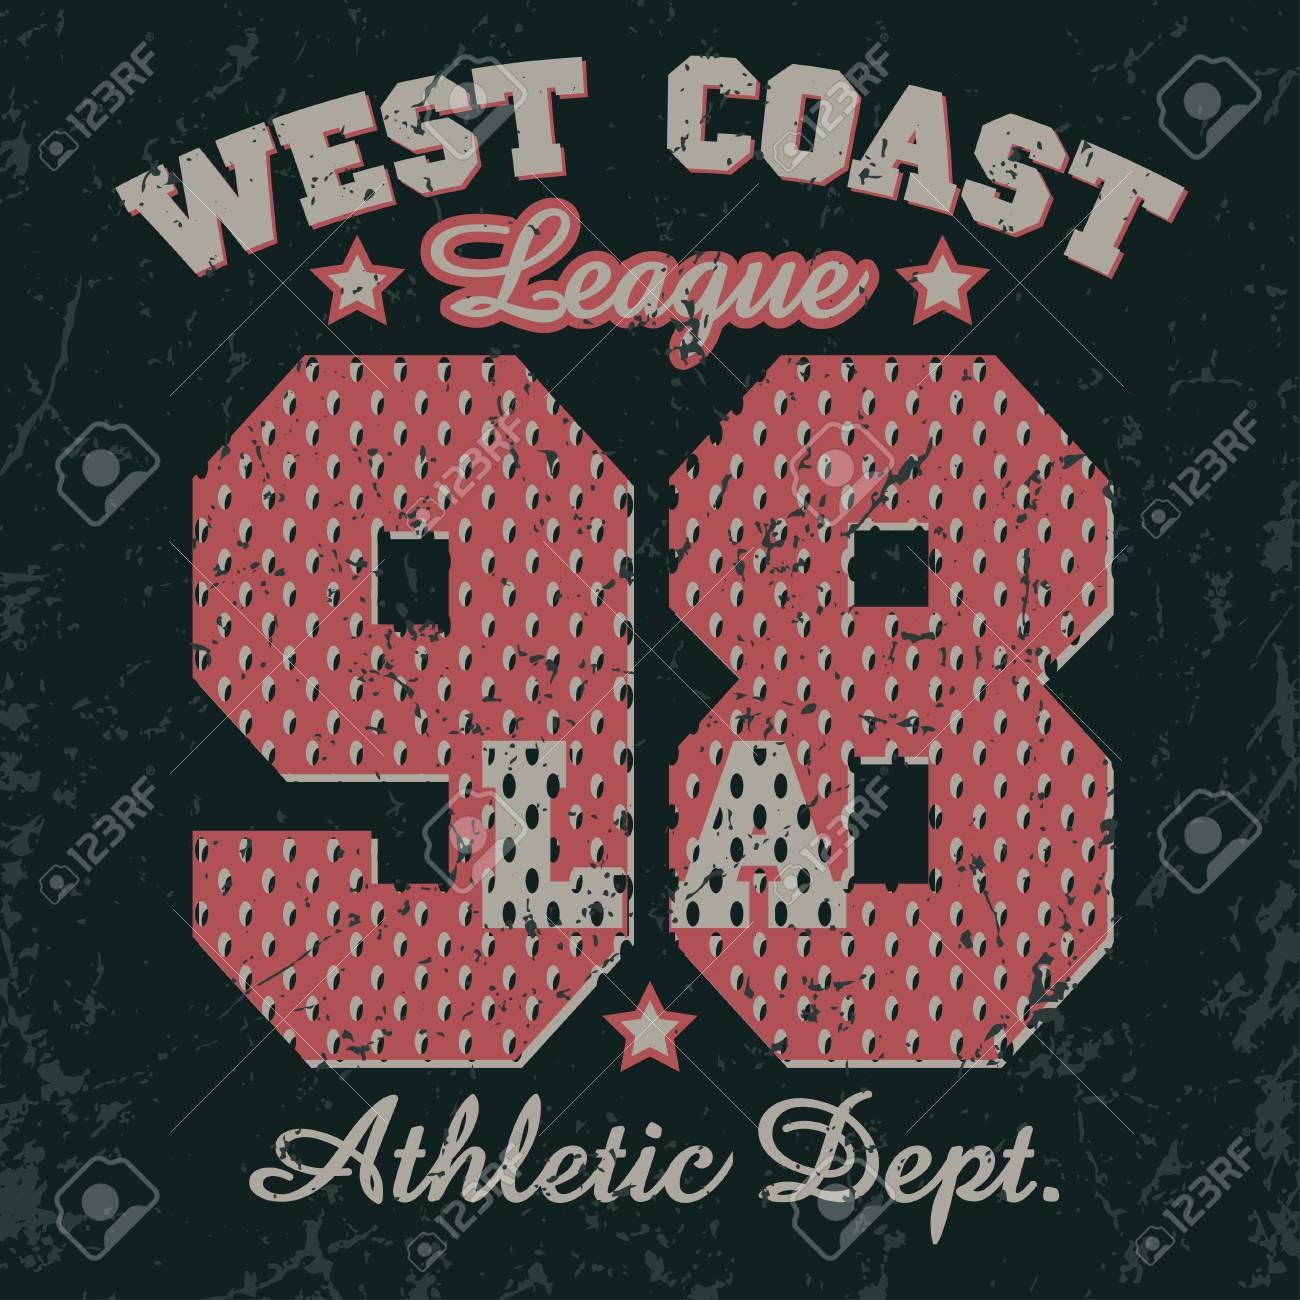 ba360a6f6 California Sport wear typography emblem, t-shirt stamp graphics, vintage tee  print,